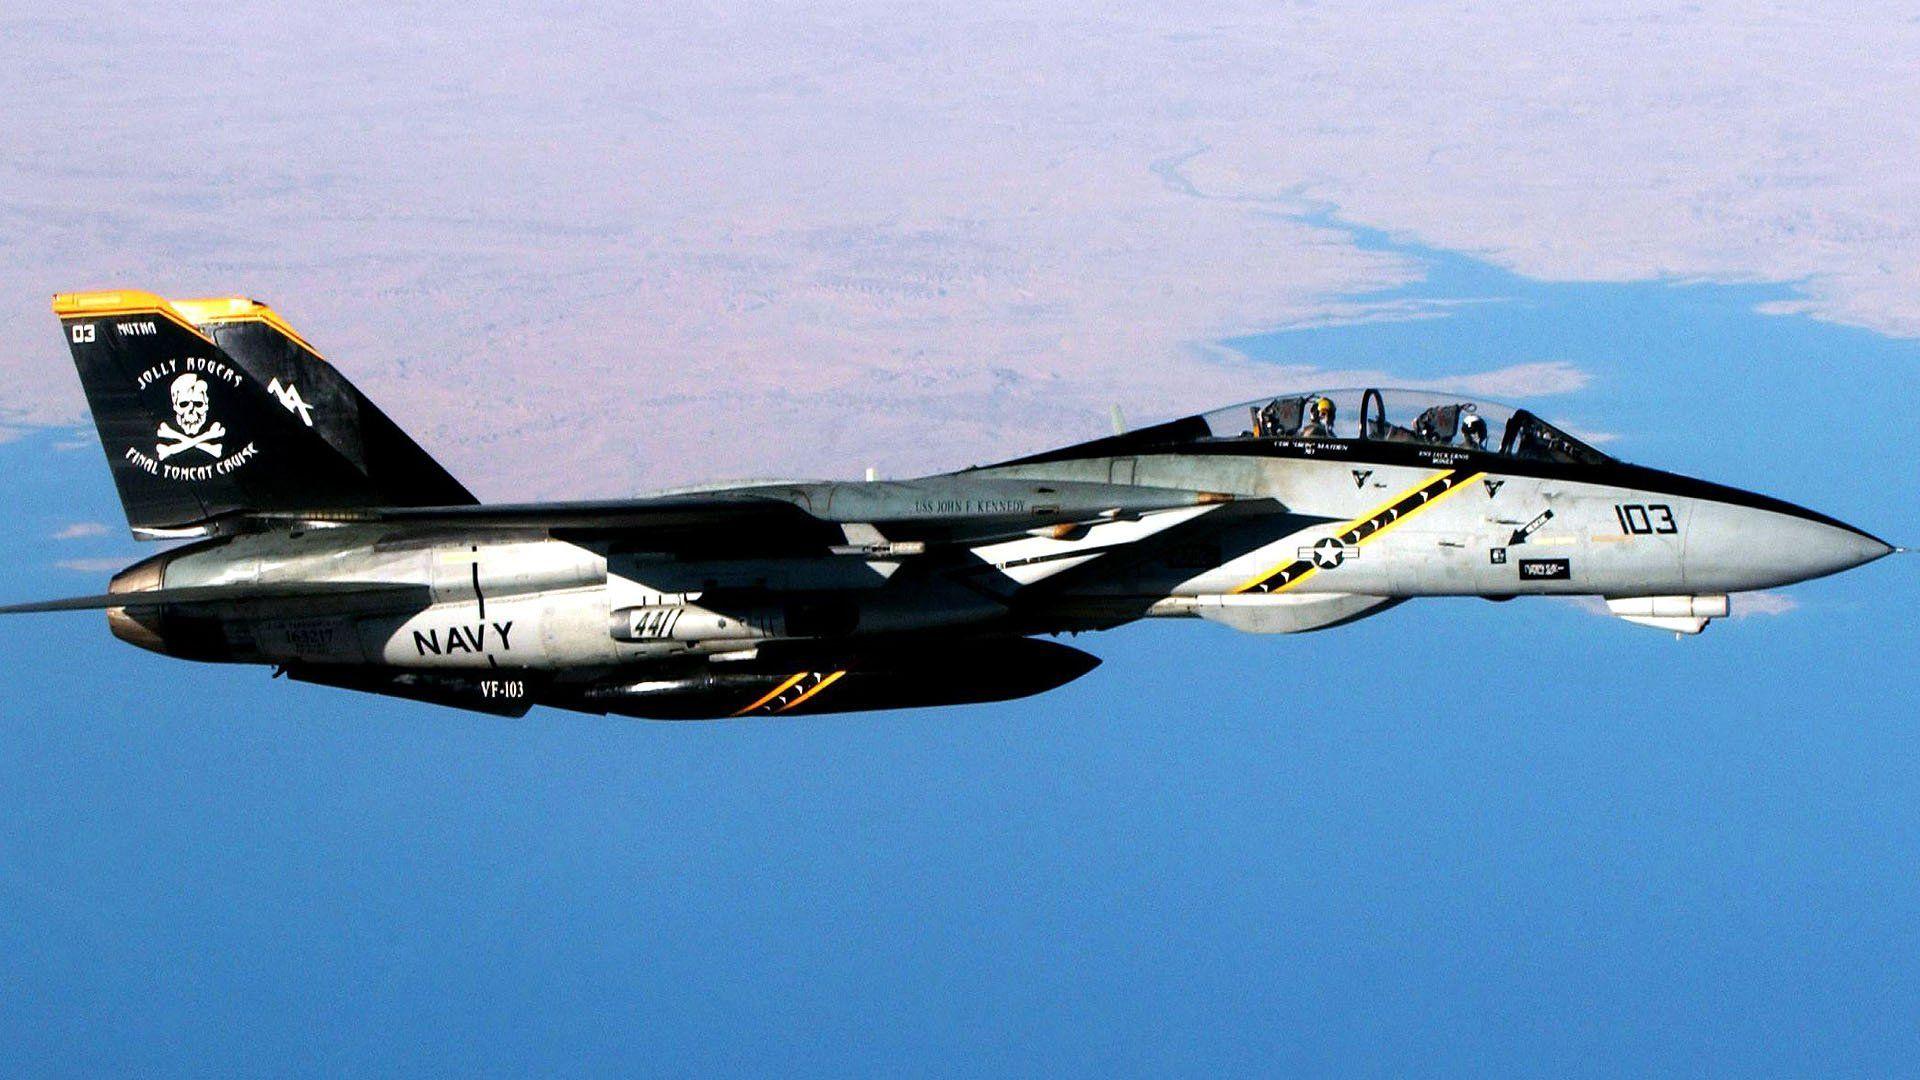 F 14 Tomcat Jolly Rogers Wallpaper Walldevil Best Free Hd